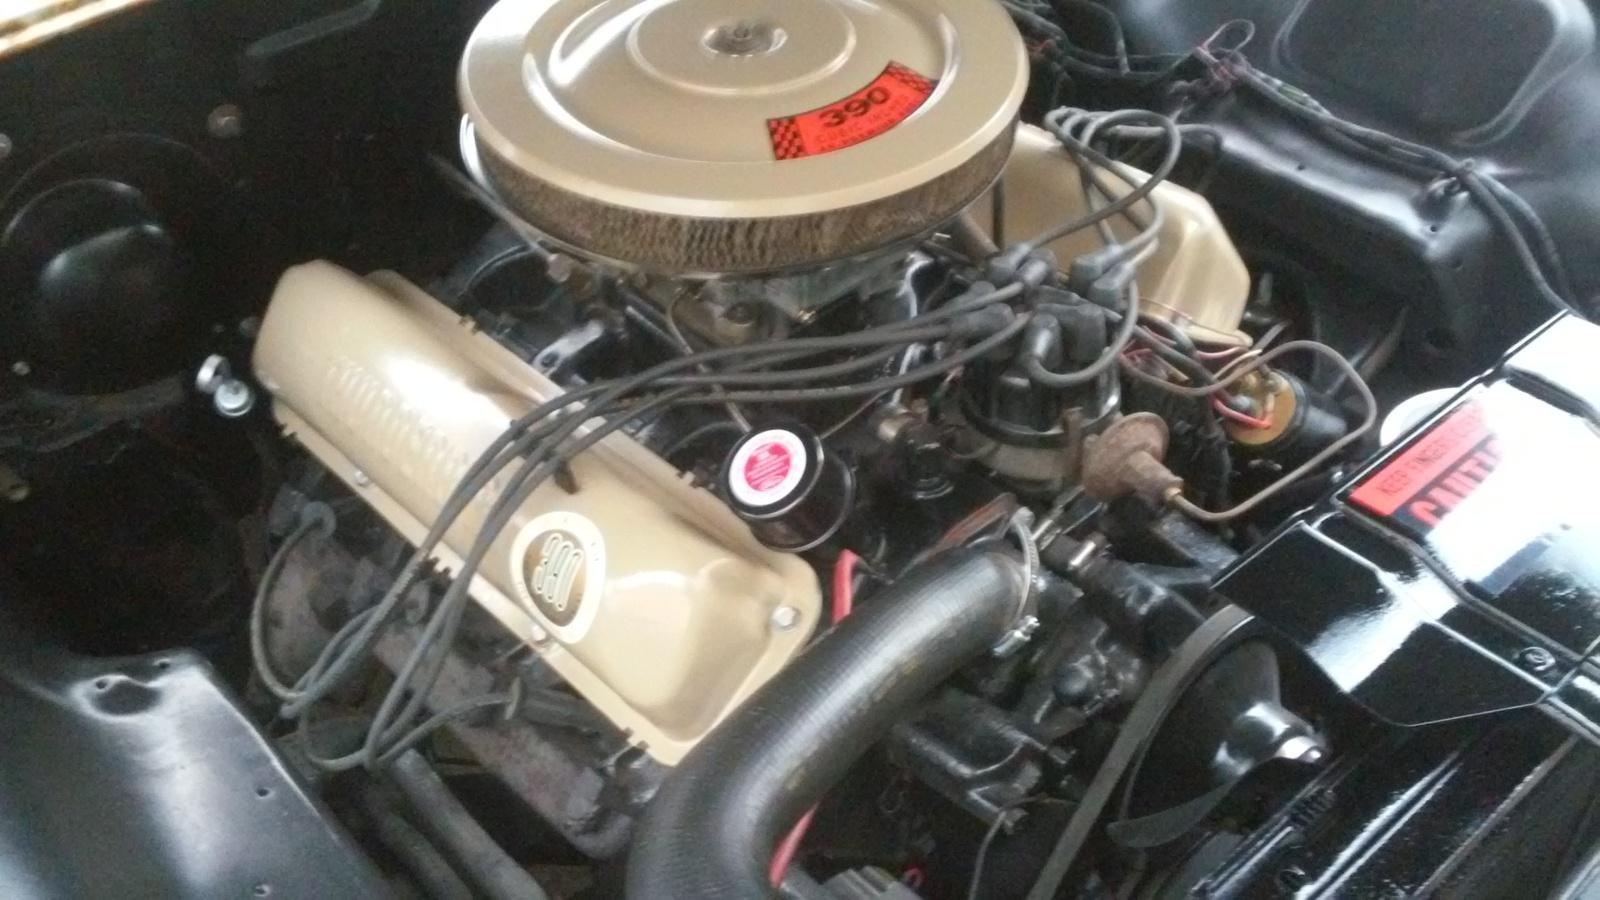 Ford Galaxie Questions Shifter Problems Cargurus 1967 390 Wiring Diagram Mark Helpful